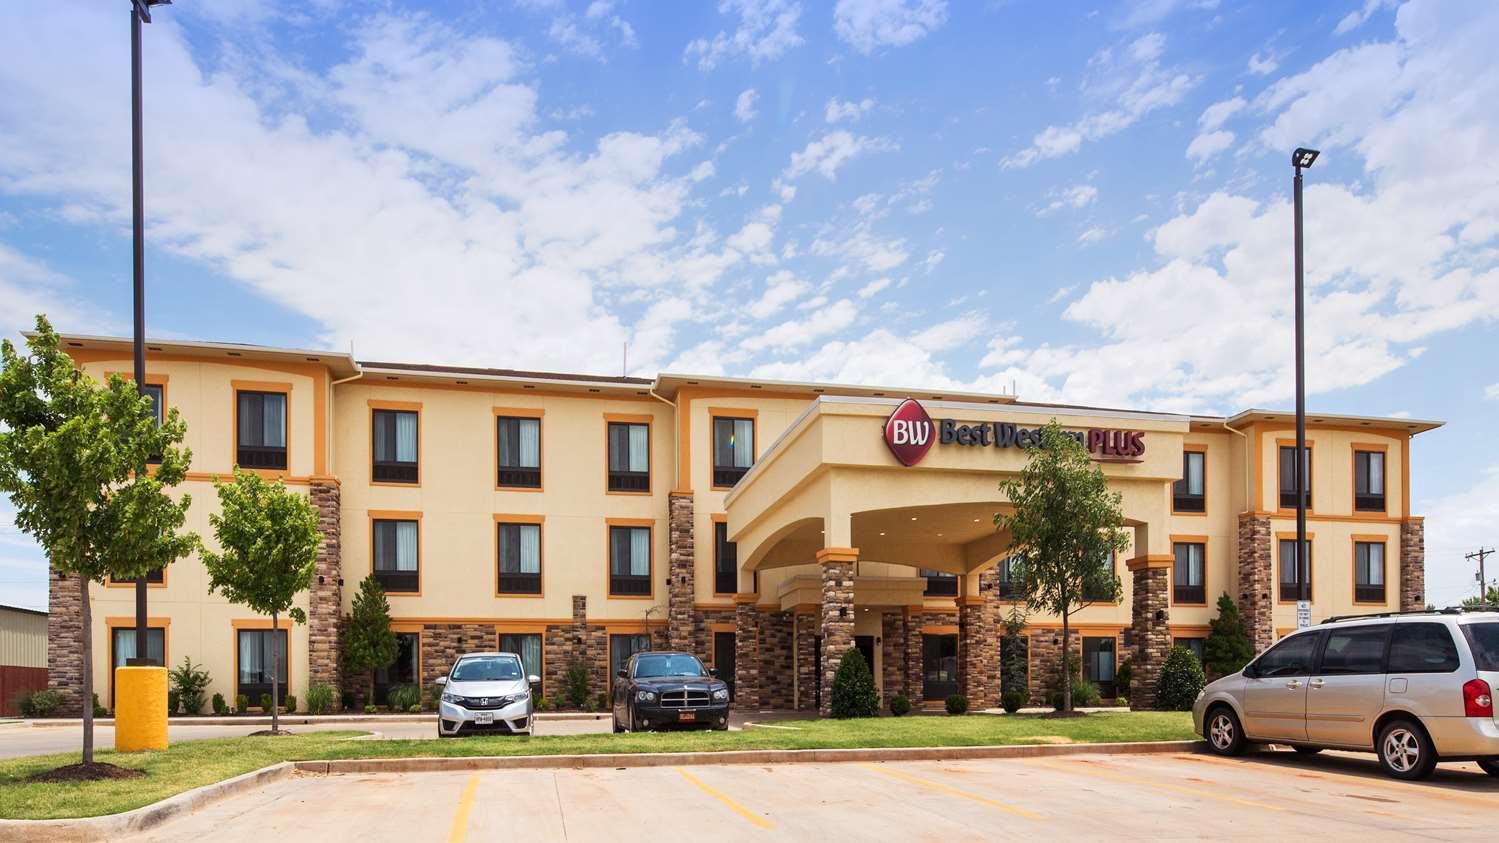 Fairview Inn Suites Healdsburg UnitedStates